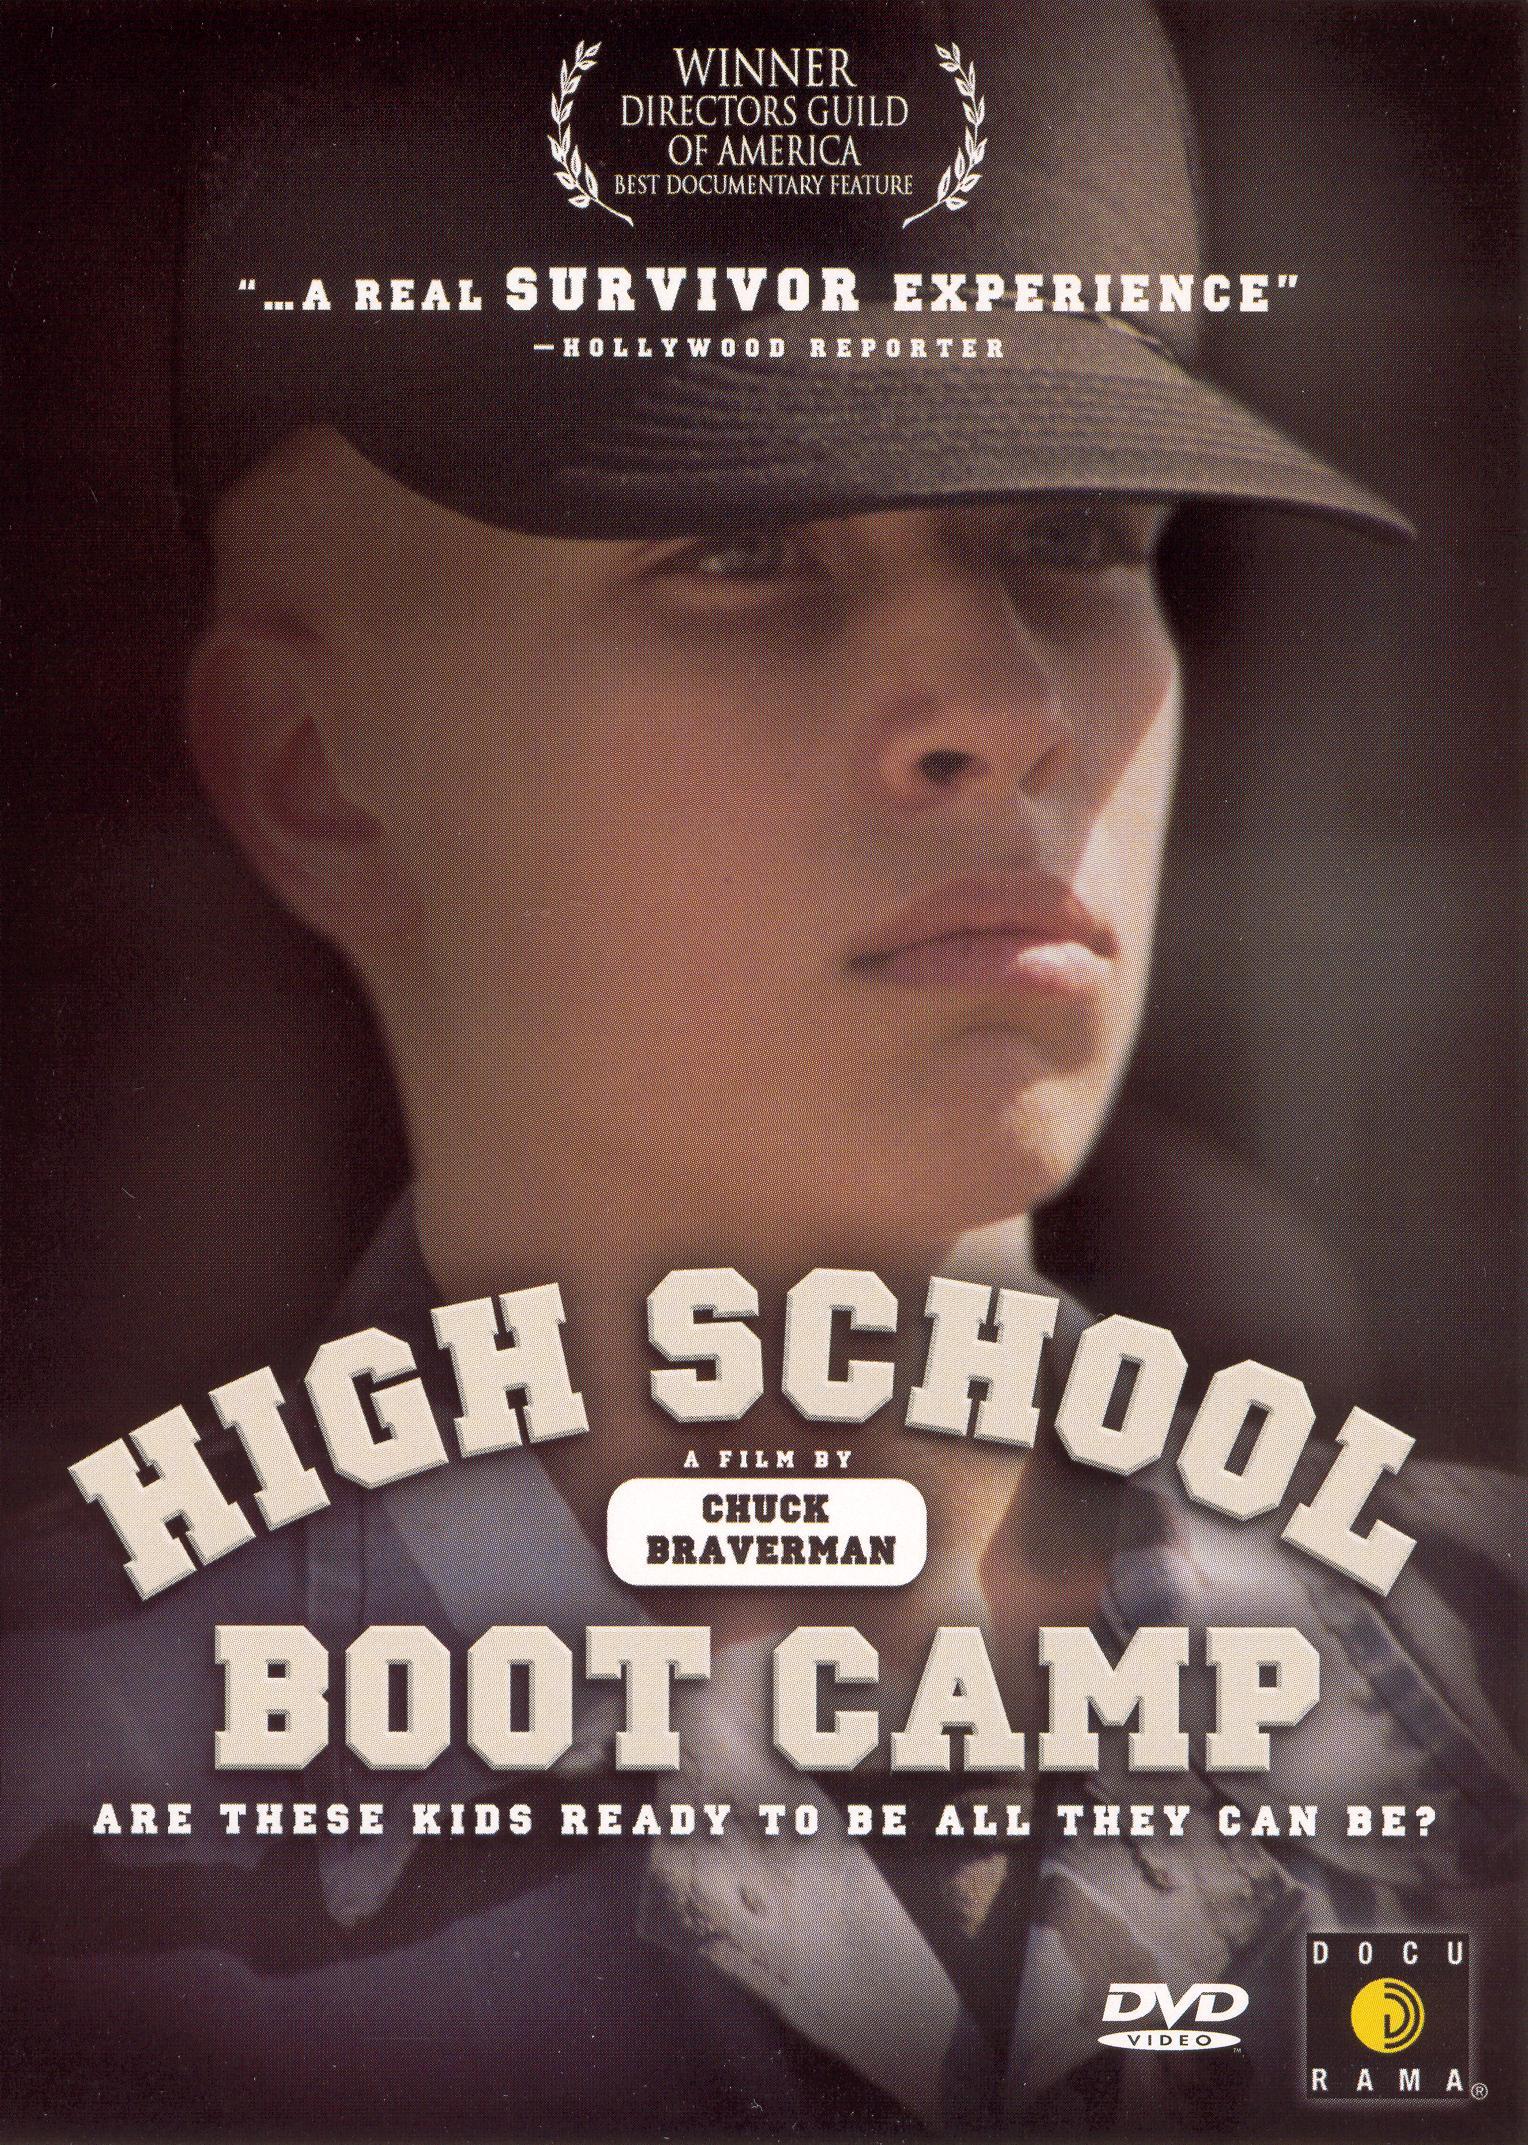 High School Boot Camp (2000) - Chuck Braverman | Synopsis ...